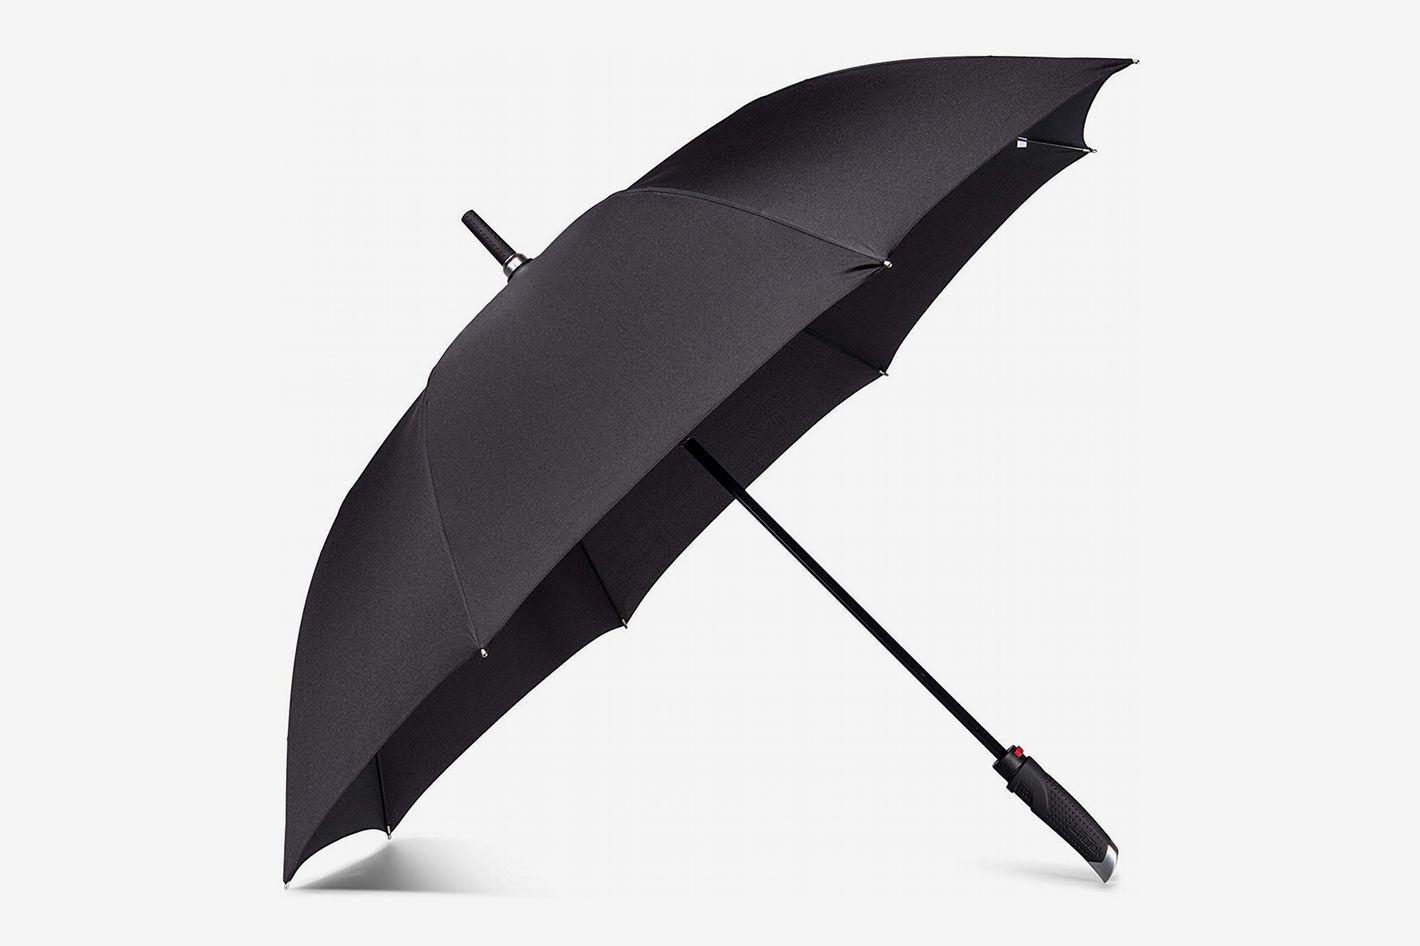 1b8ec68f58069 The 37 Best Umbrellas You Can Buy 2019